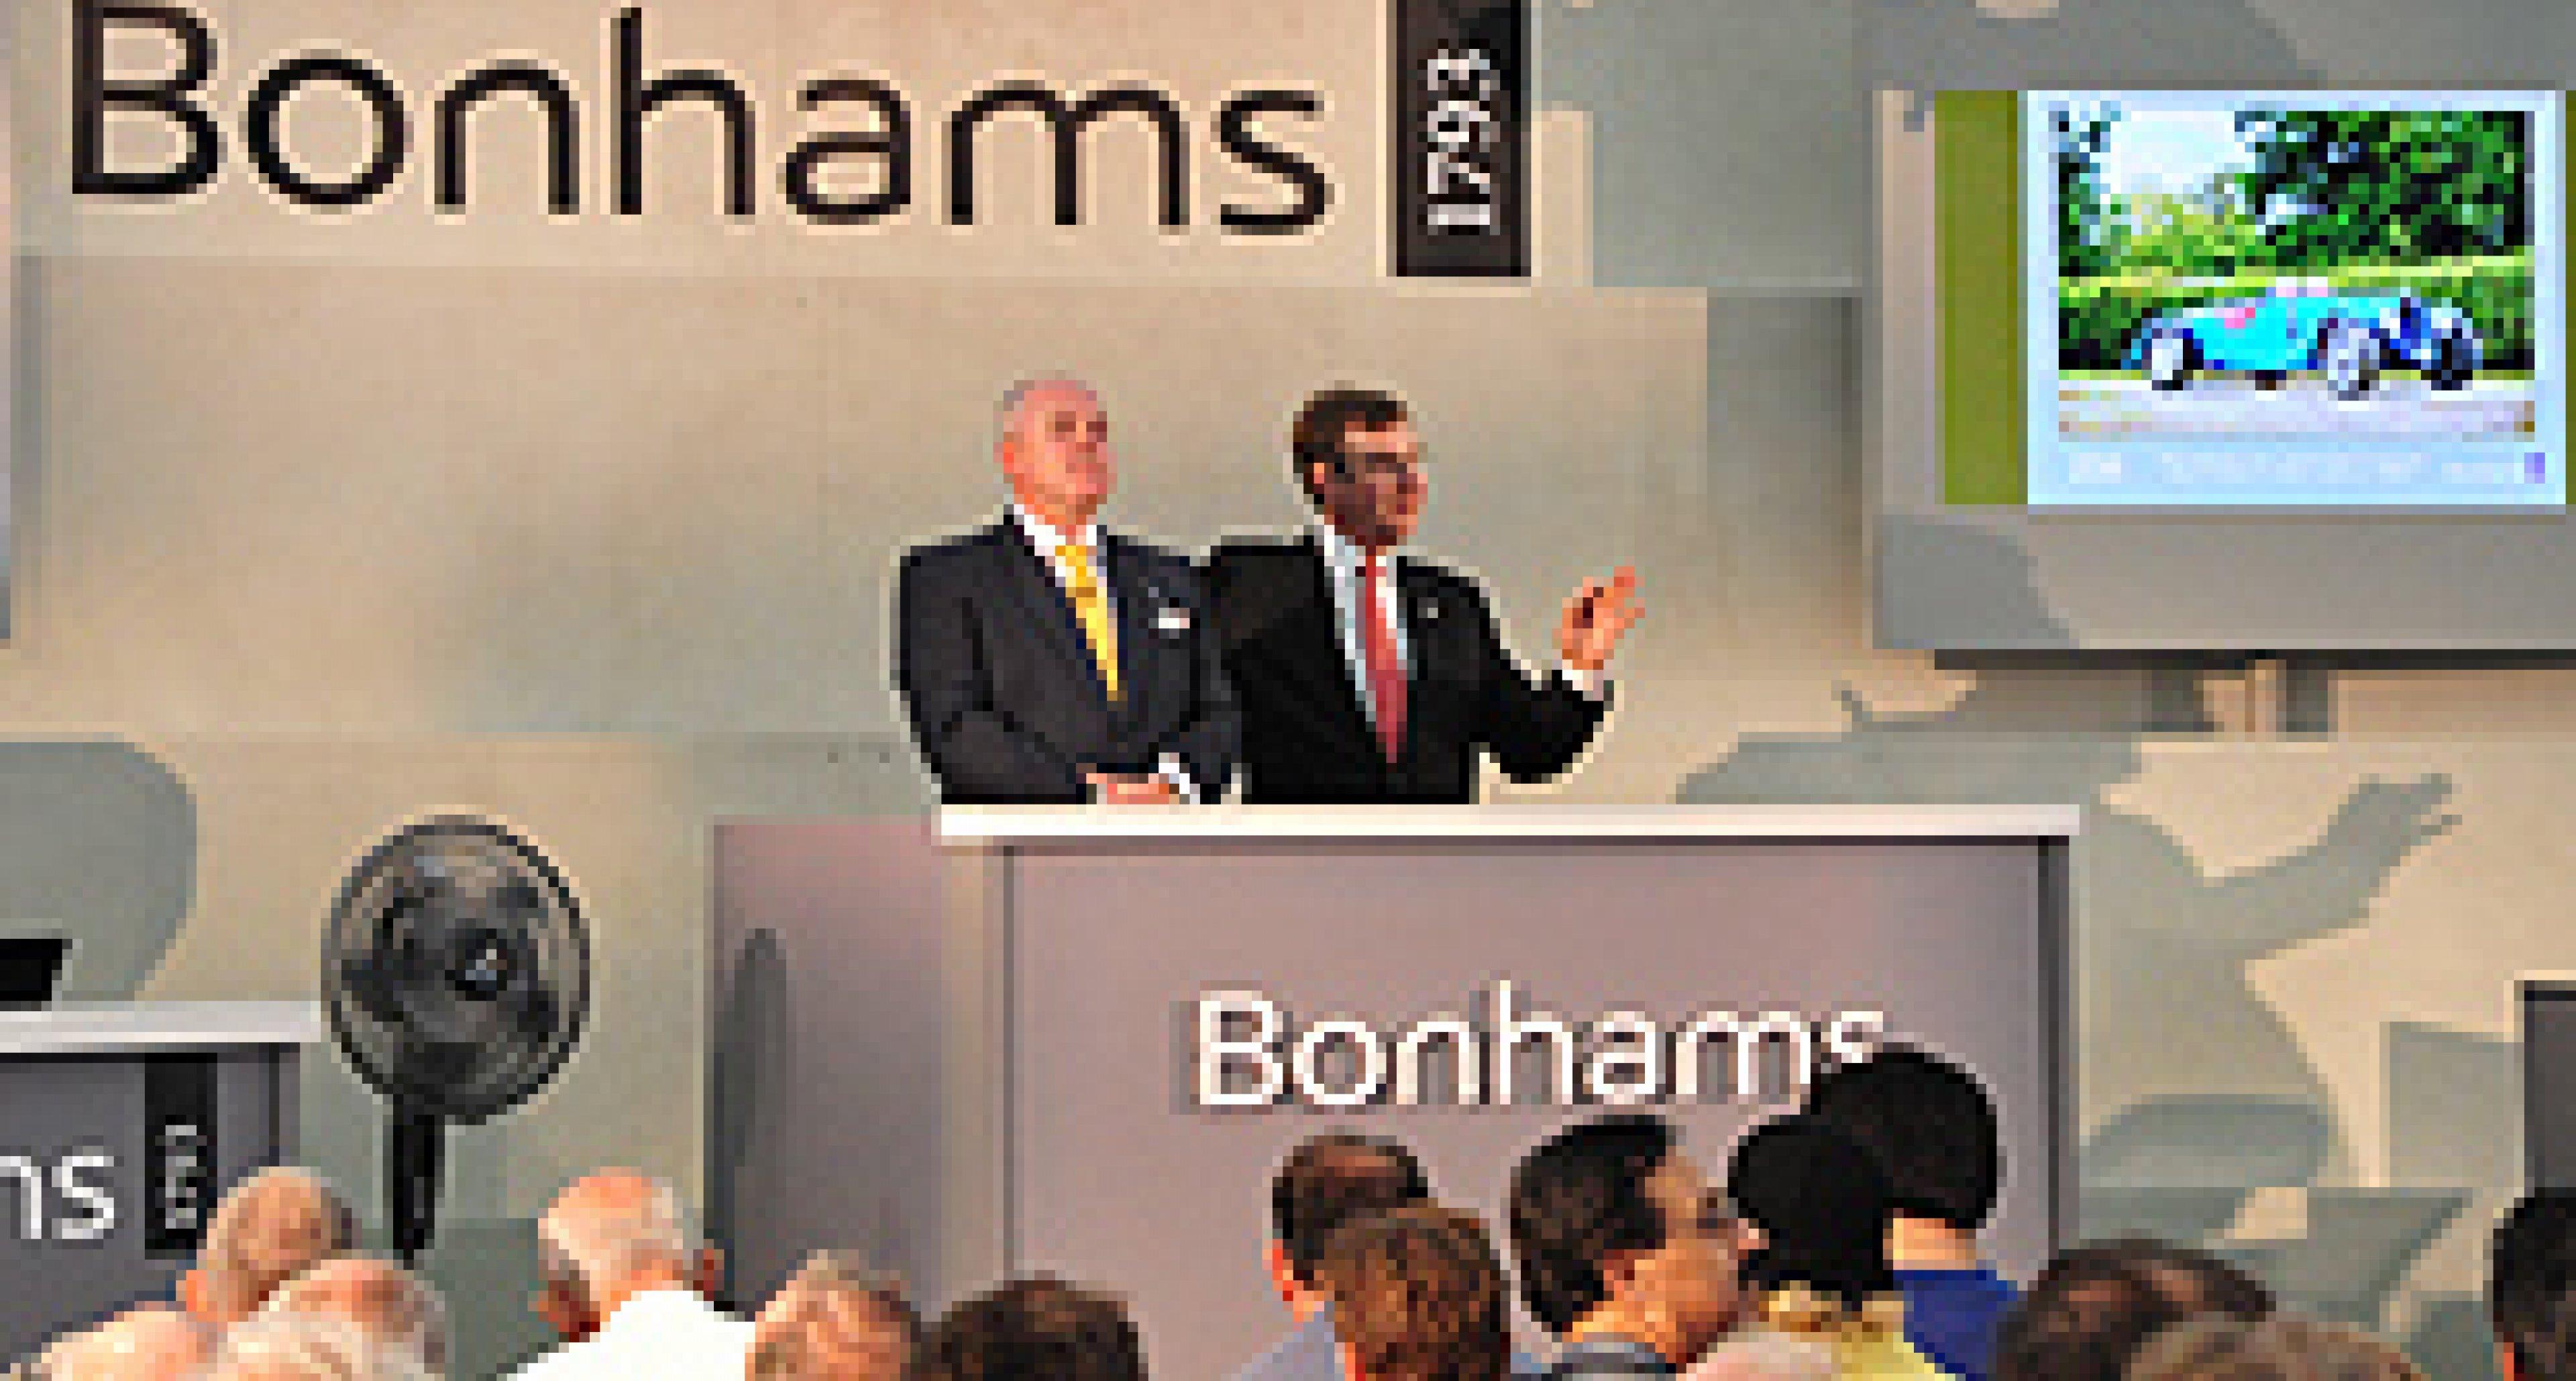 Bonhams at the Goodwood Revival, 16 September  2011: Review